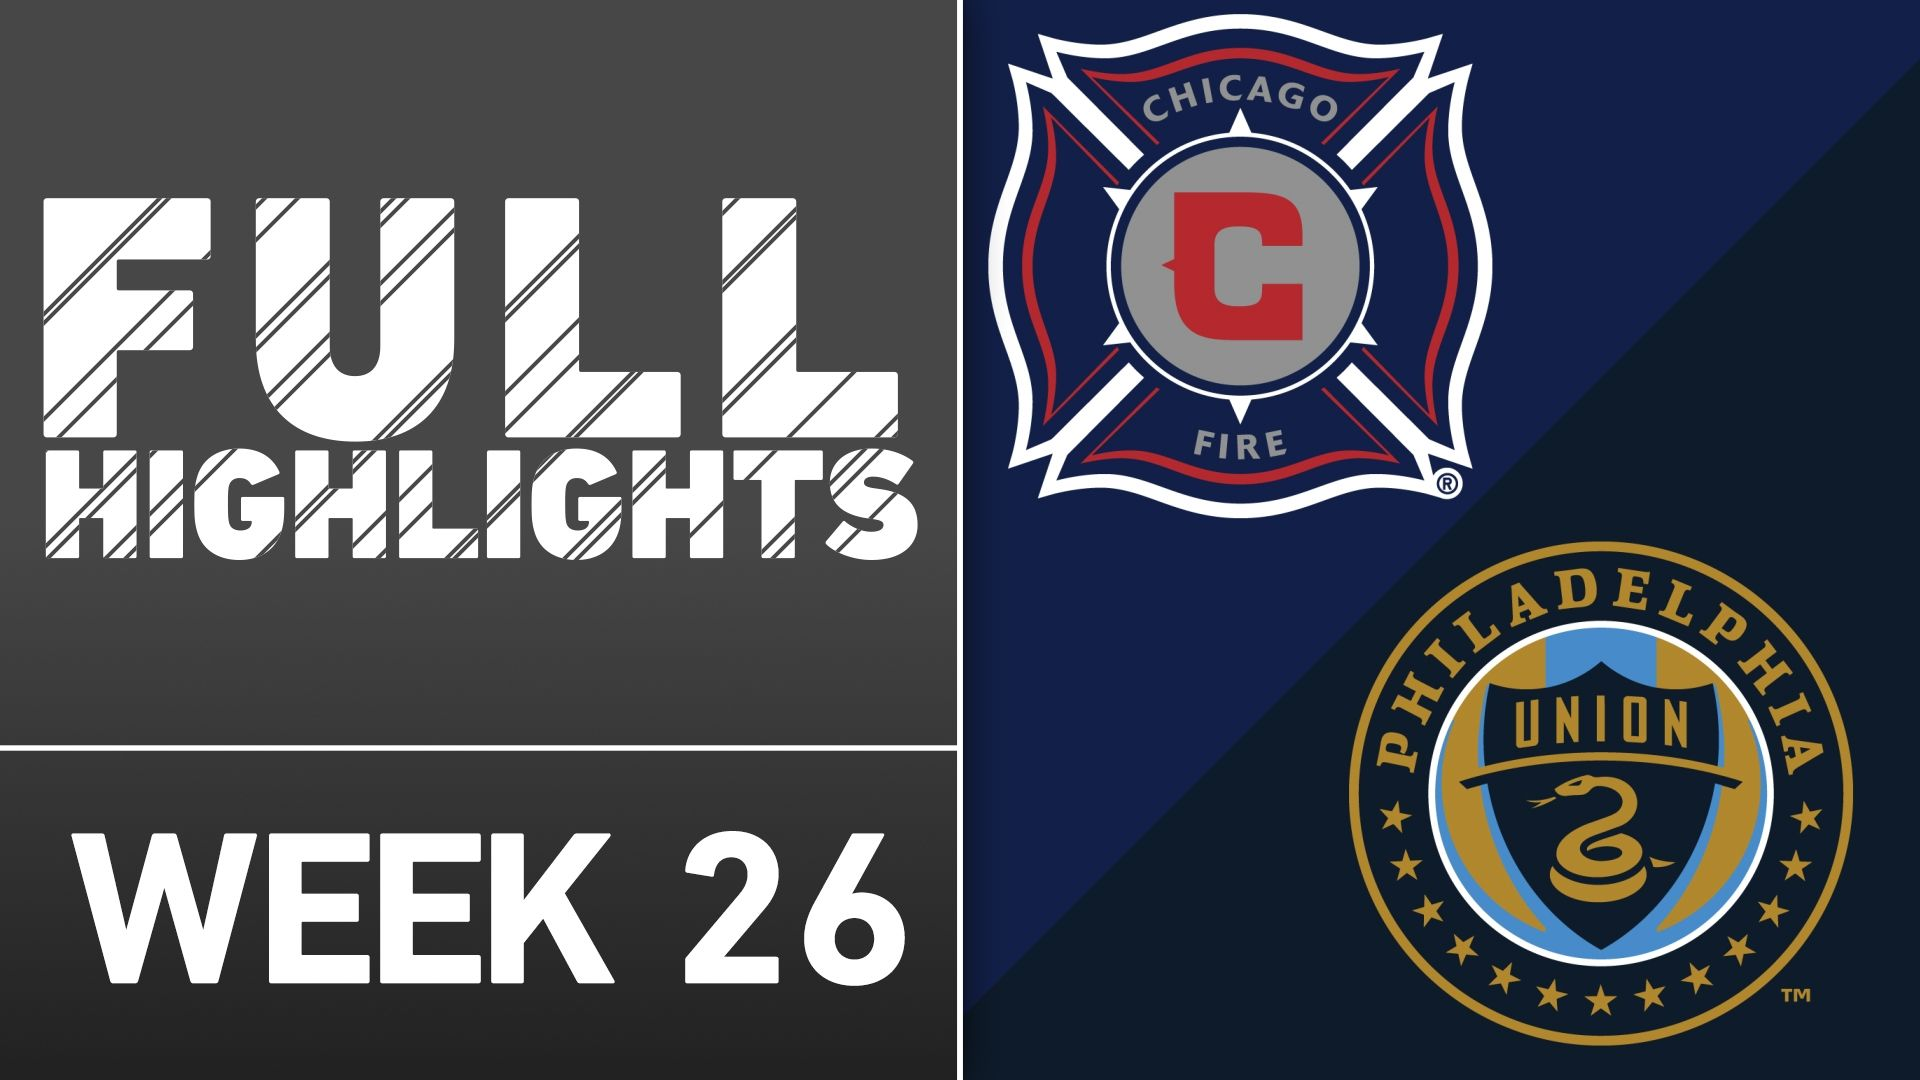 Video via MLS: Chicago 3-0 Philadelphia